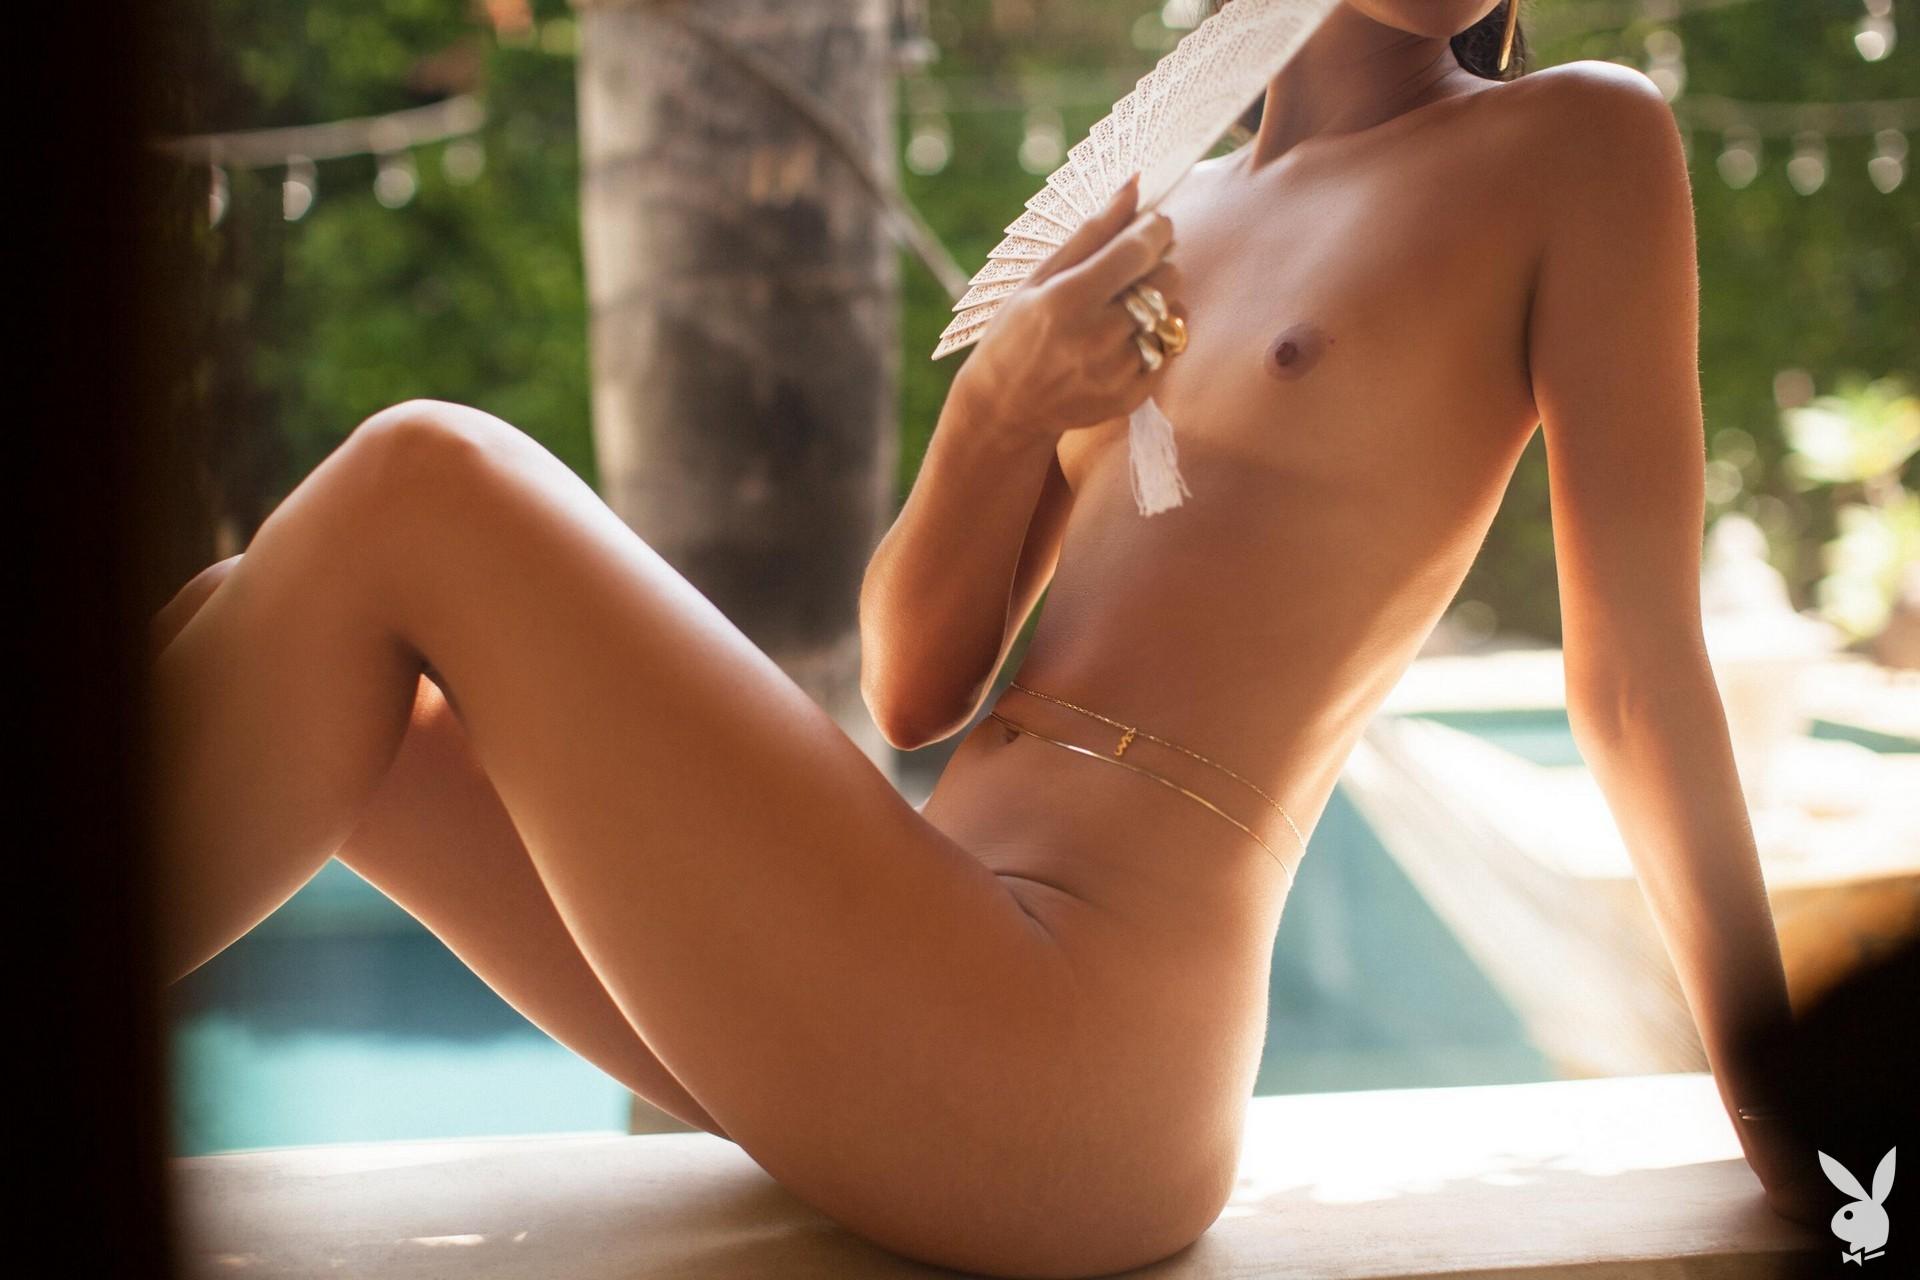 Playmate September 2020 Danielle Alcaraz Playboy Plus (19)